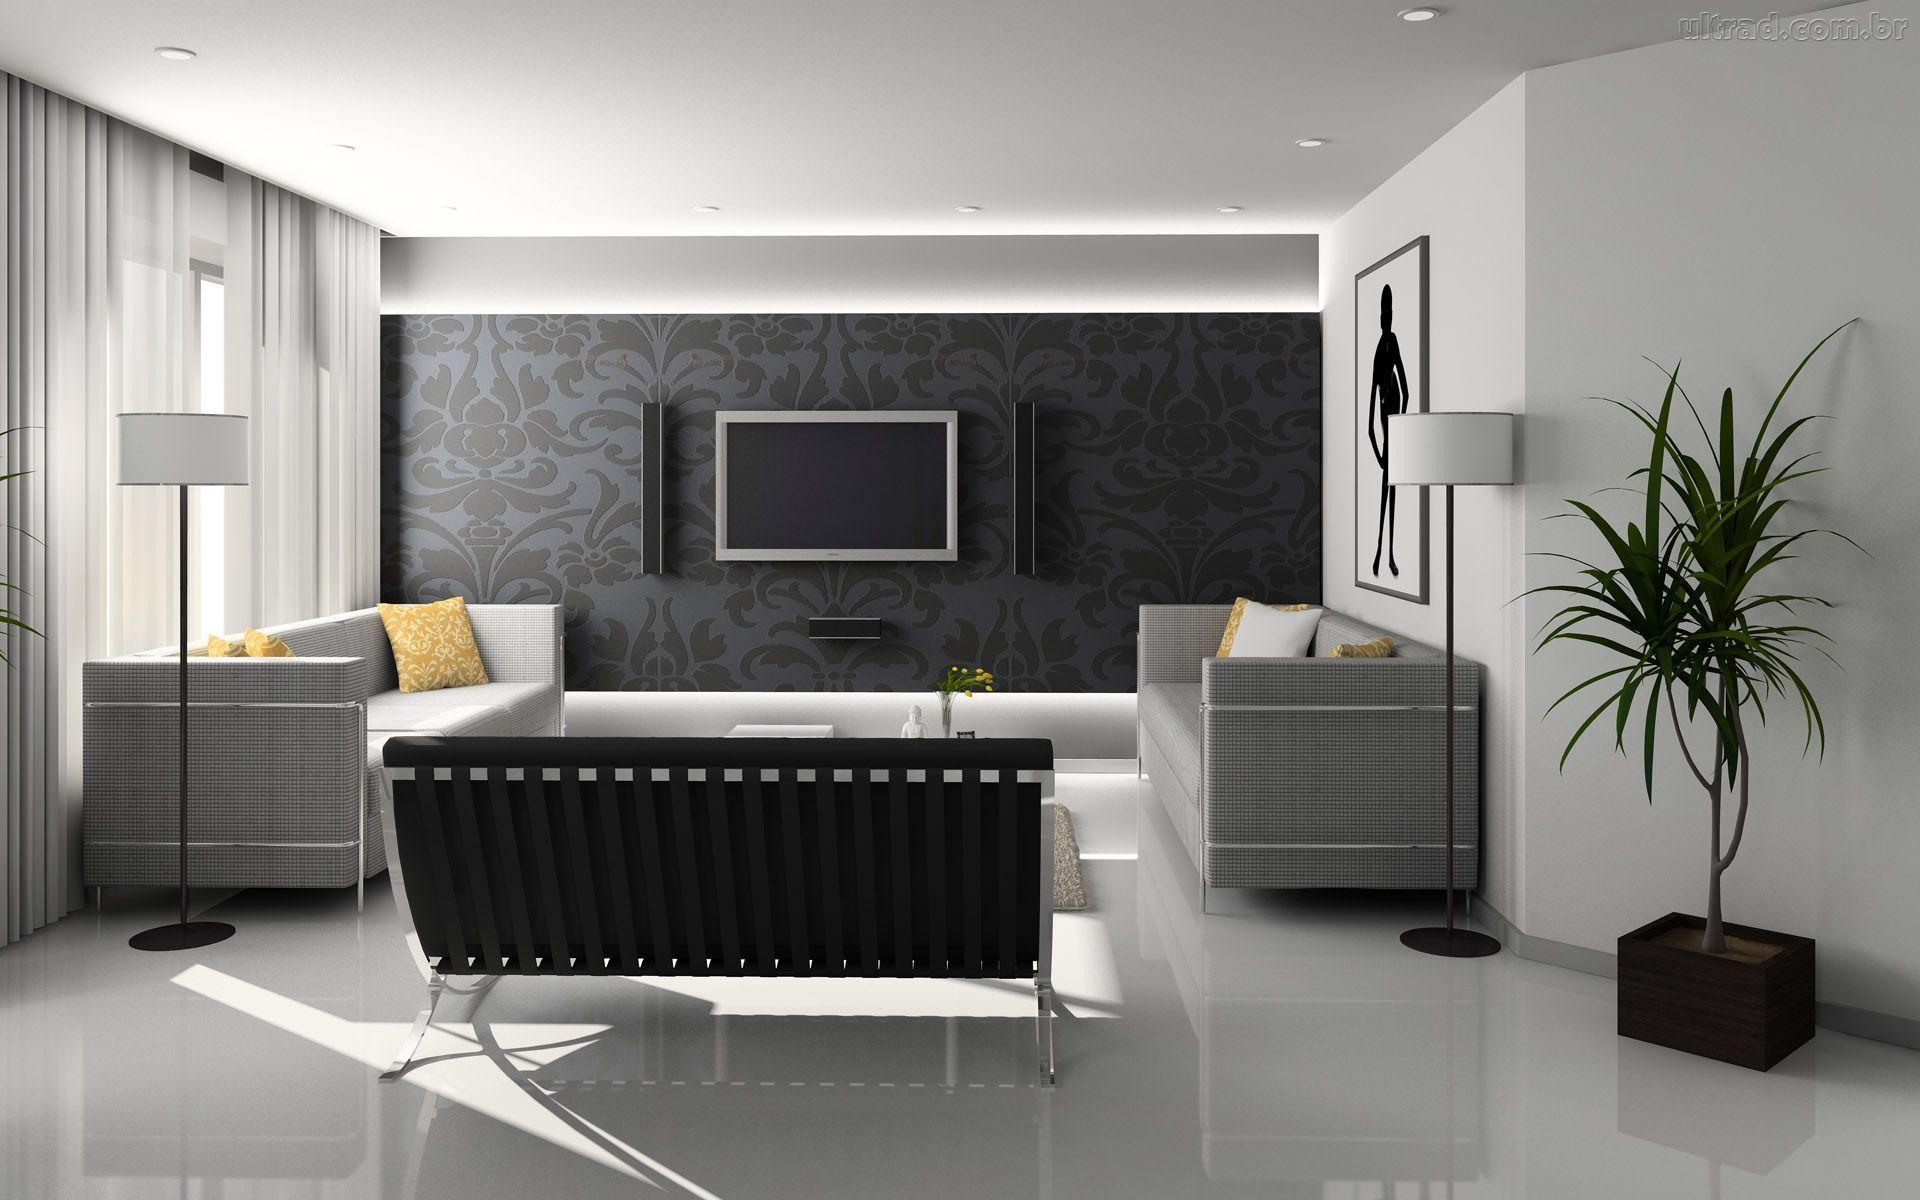 Noticias y tendencias muebles modernos para tu sala for Tapices para sillas modernas